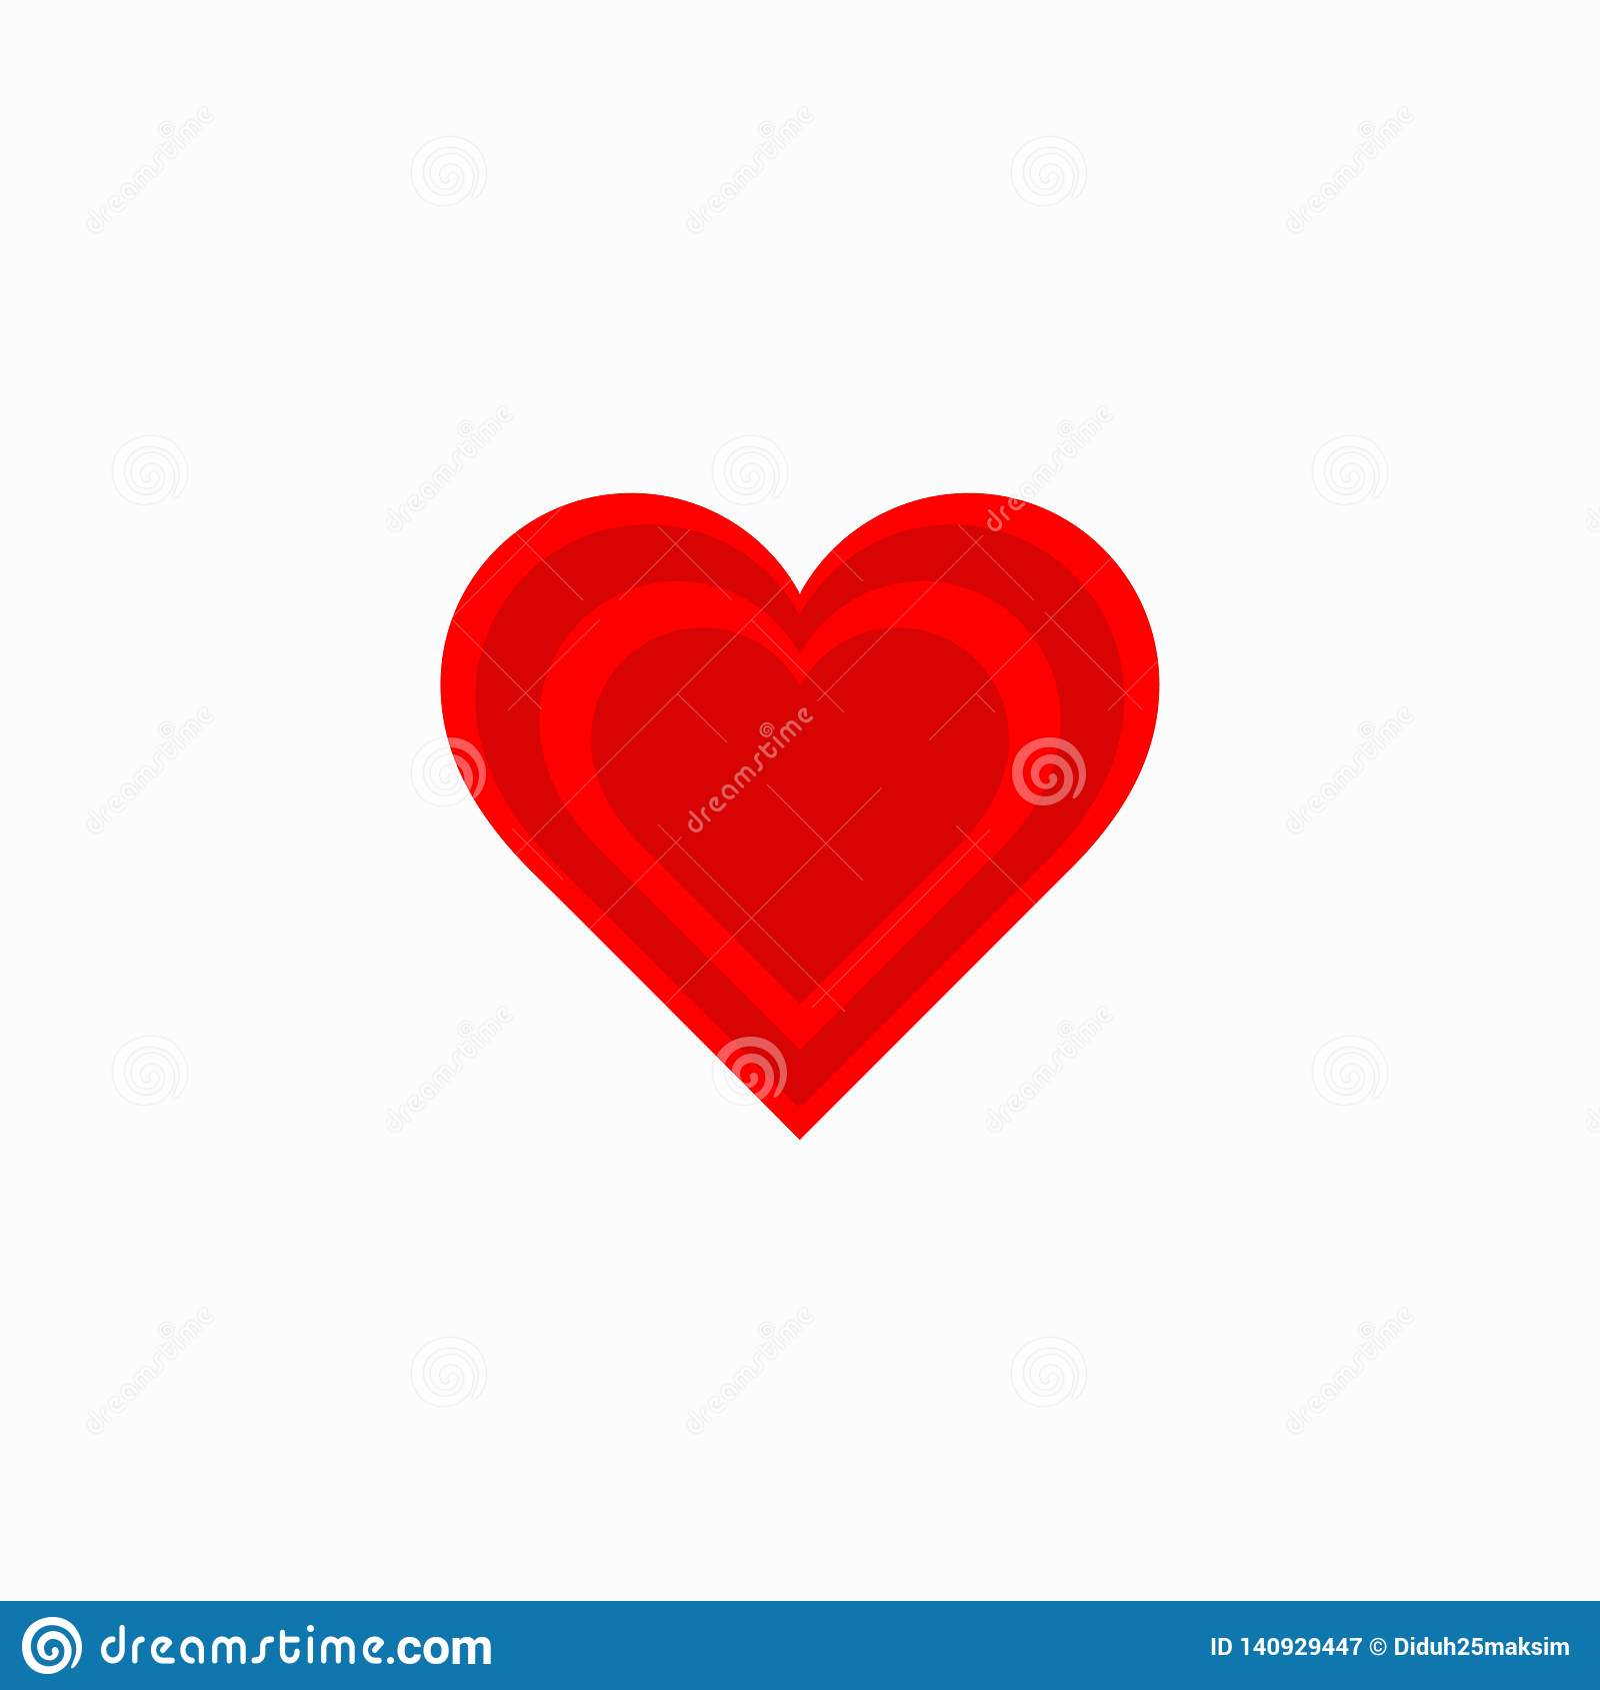 Red heart. Icon heart. Symbol love. Vector illustration. EPS 10